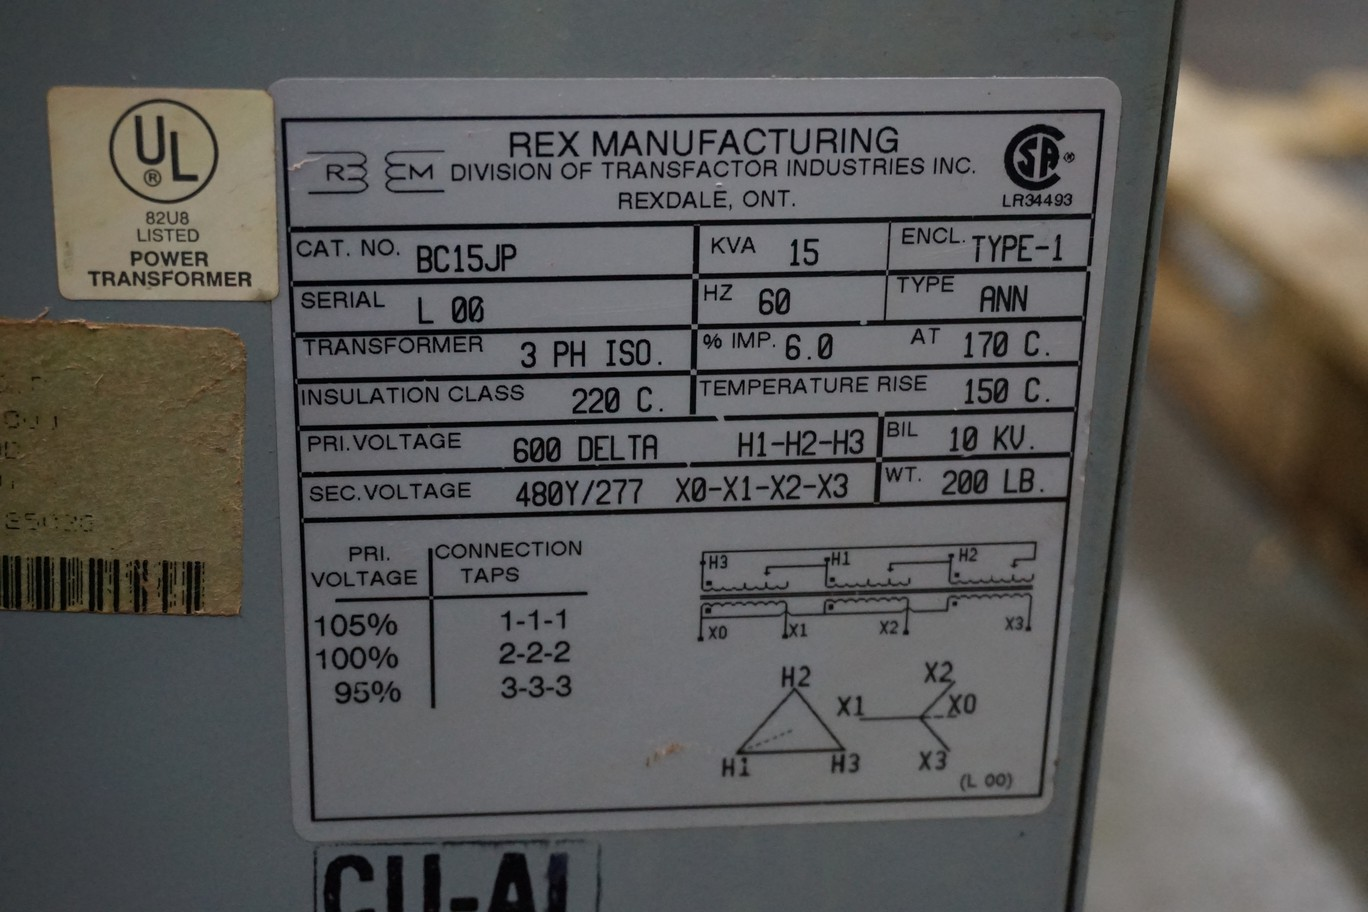 Rex Model BC15JP 600V, 15 Kva Transformer - Image 2 of 2